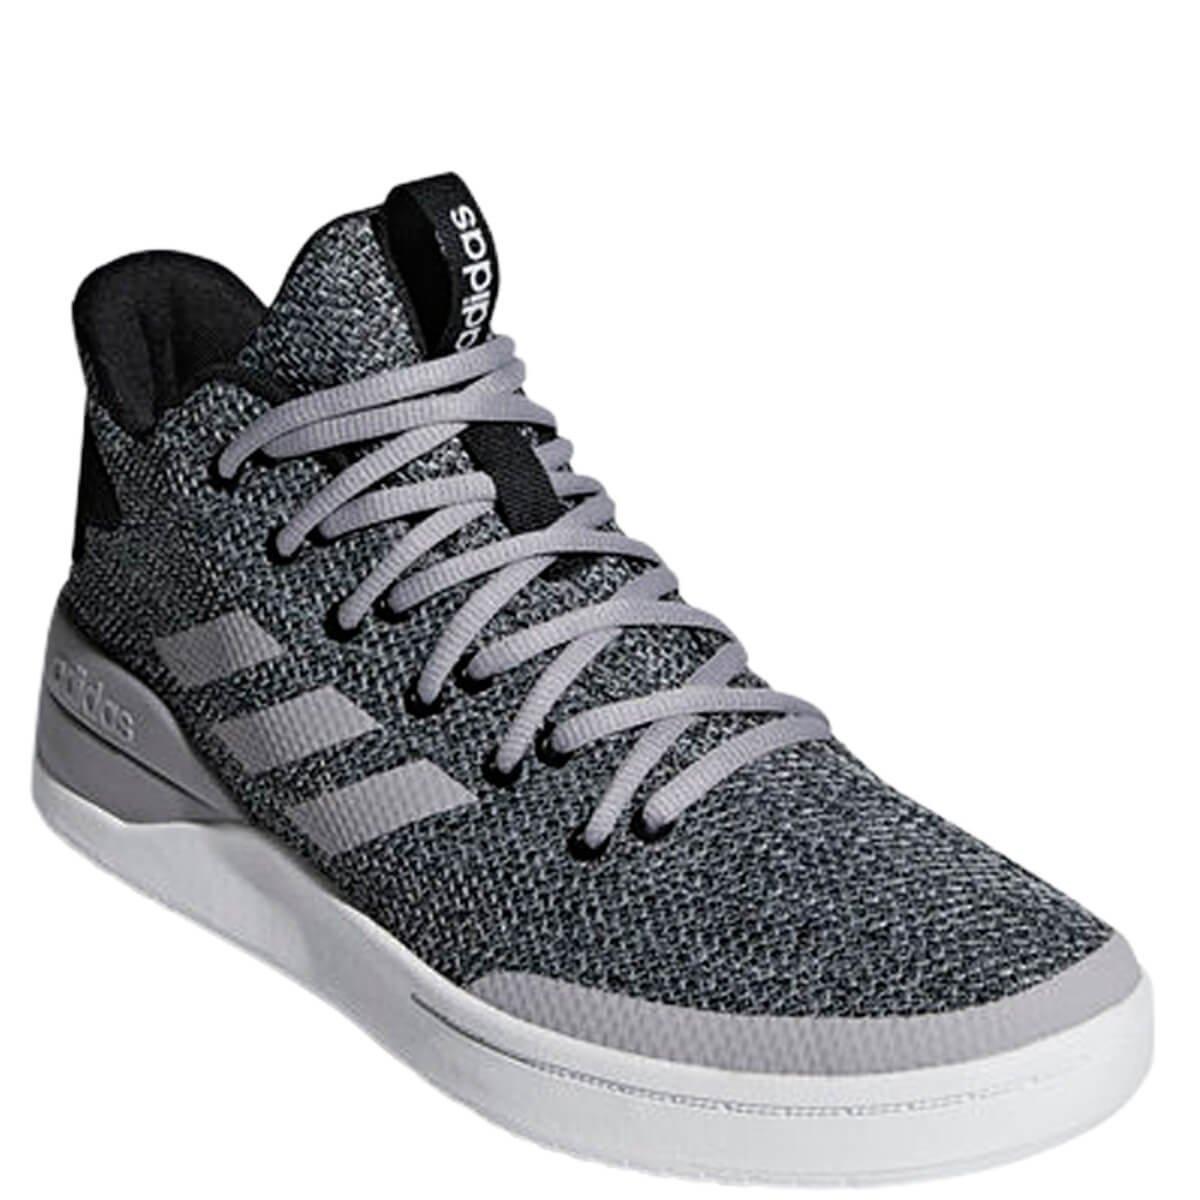 233aa53651 Bizz Store - Tênis Masculino Adidas Retro Bball